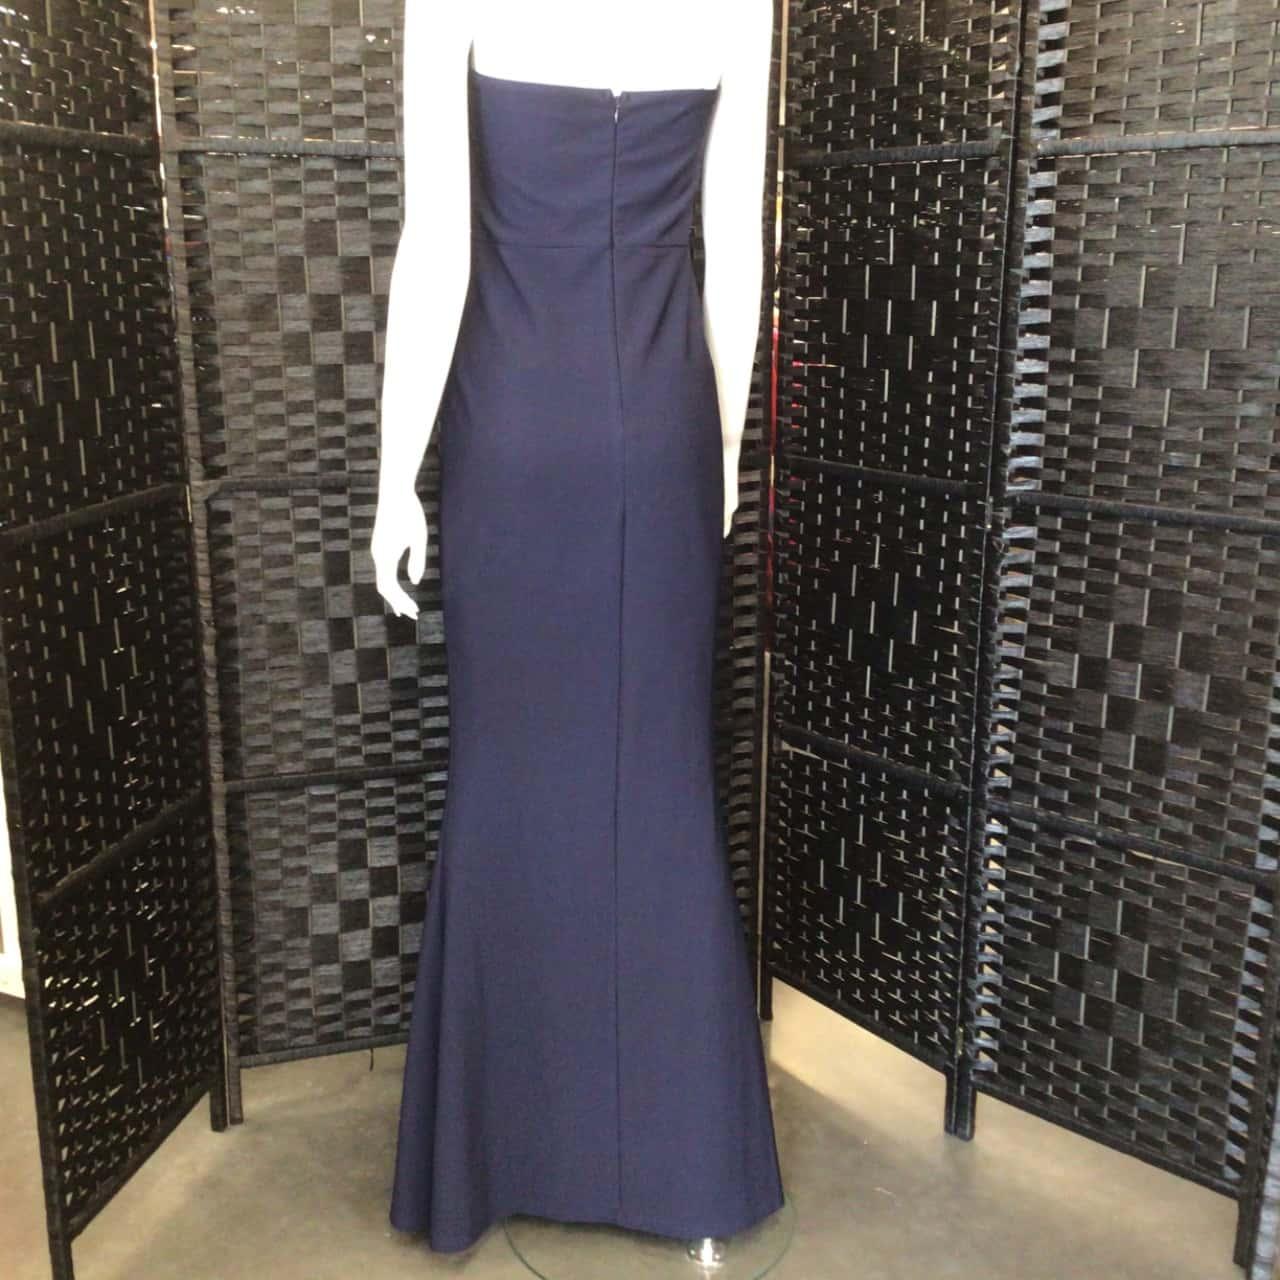 NWOT Womens  SHOWPO Size 10 Maxi Dress Formal Navy Blue